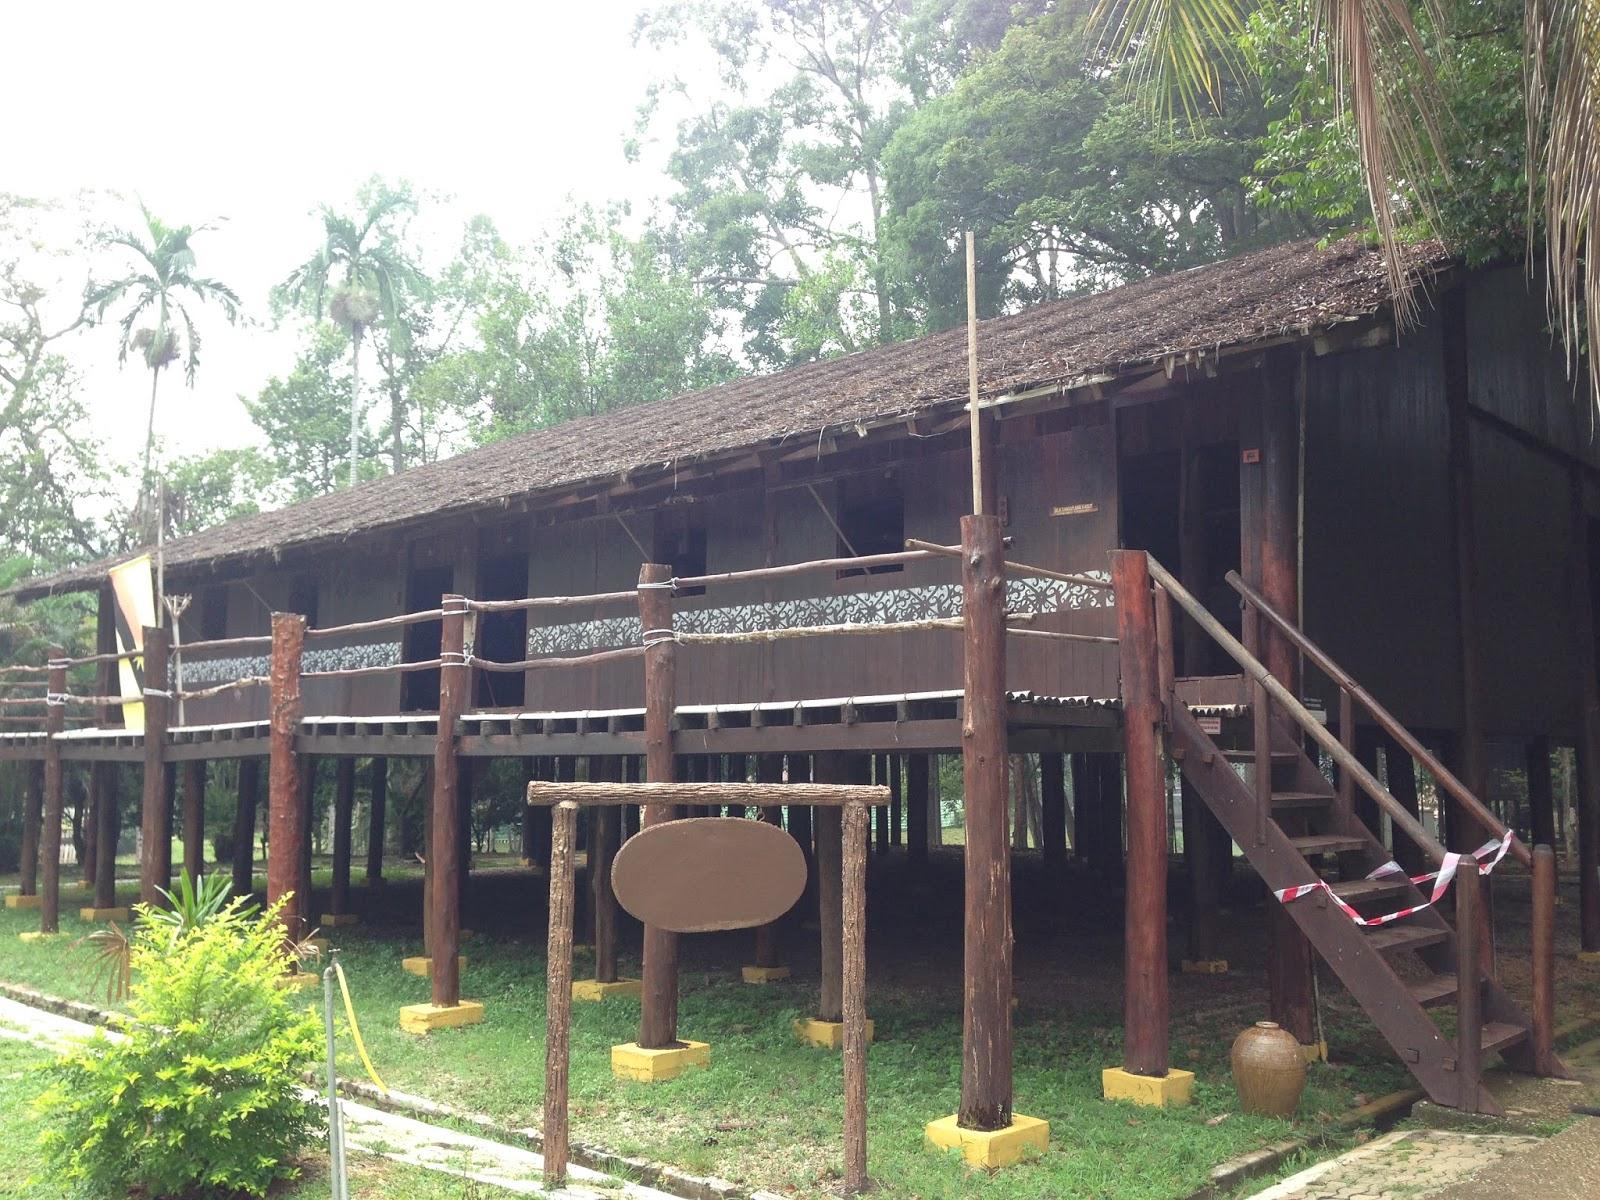 Ilmu Itu Cahaya Mari Mengenali Kaum Iban Sarawak